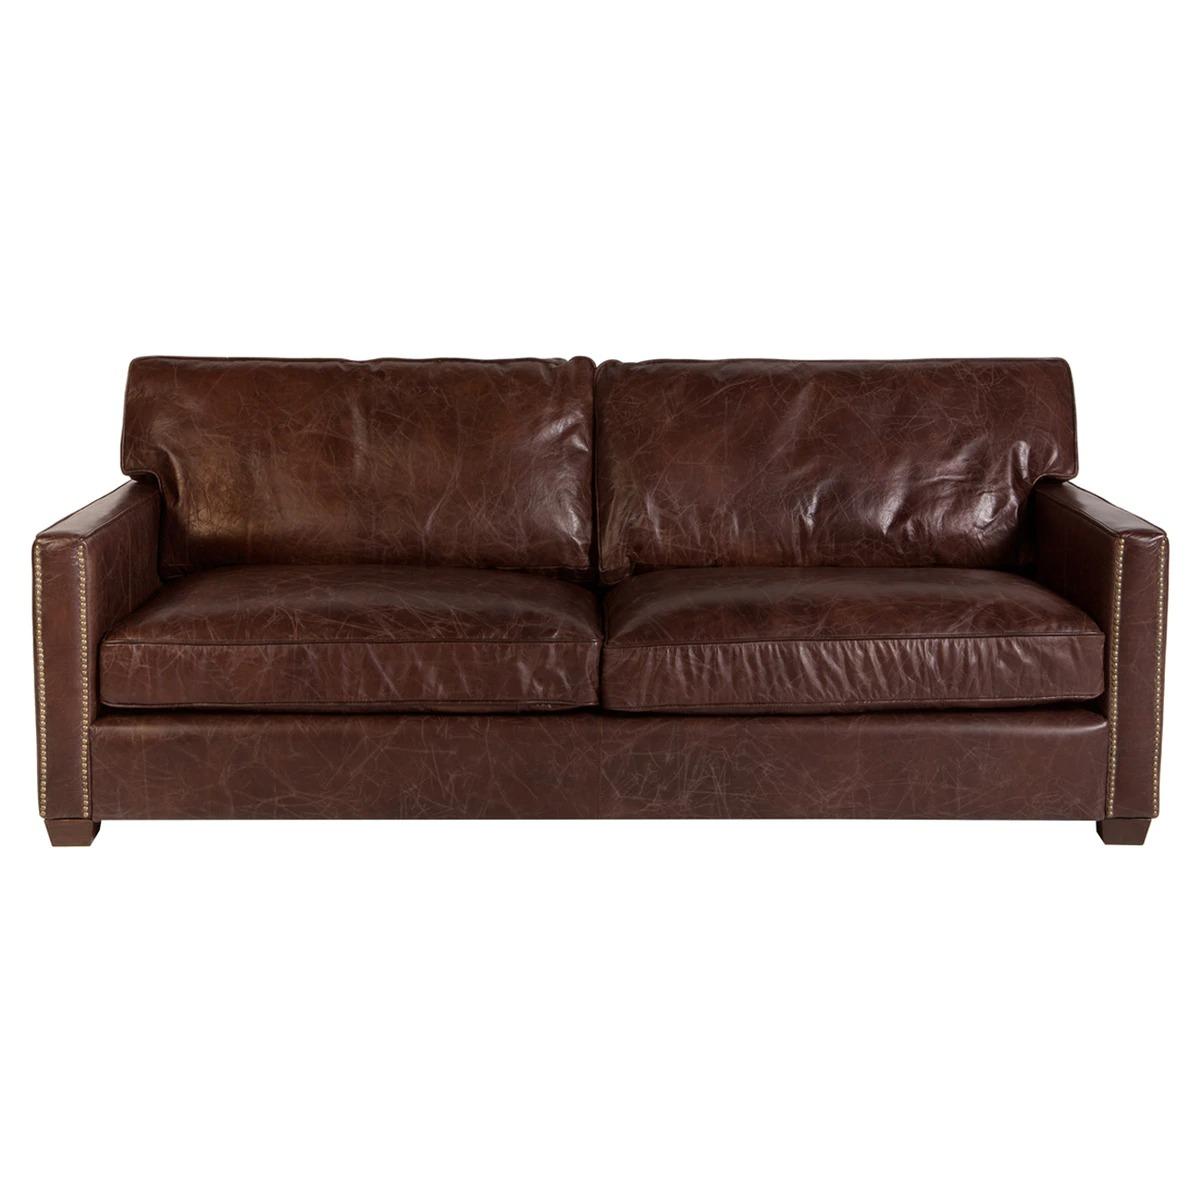 Bristol 3 Seater Leather Sofa